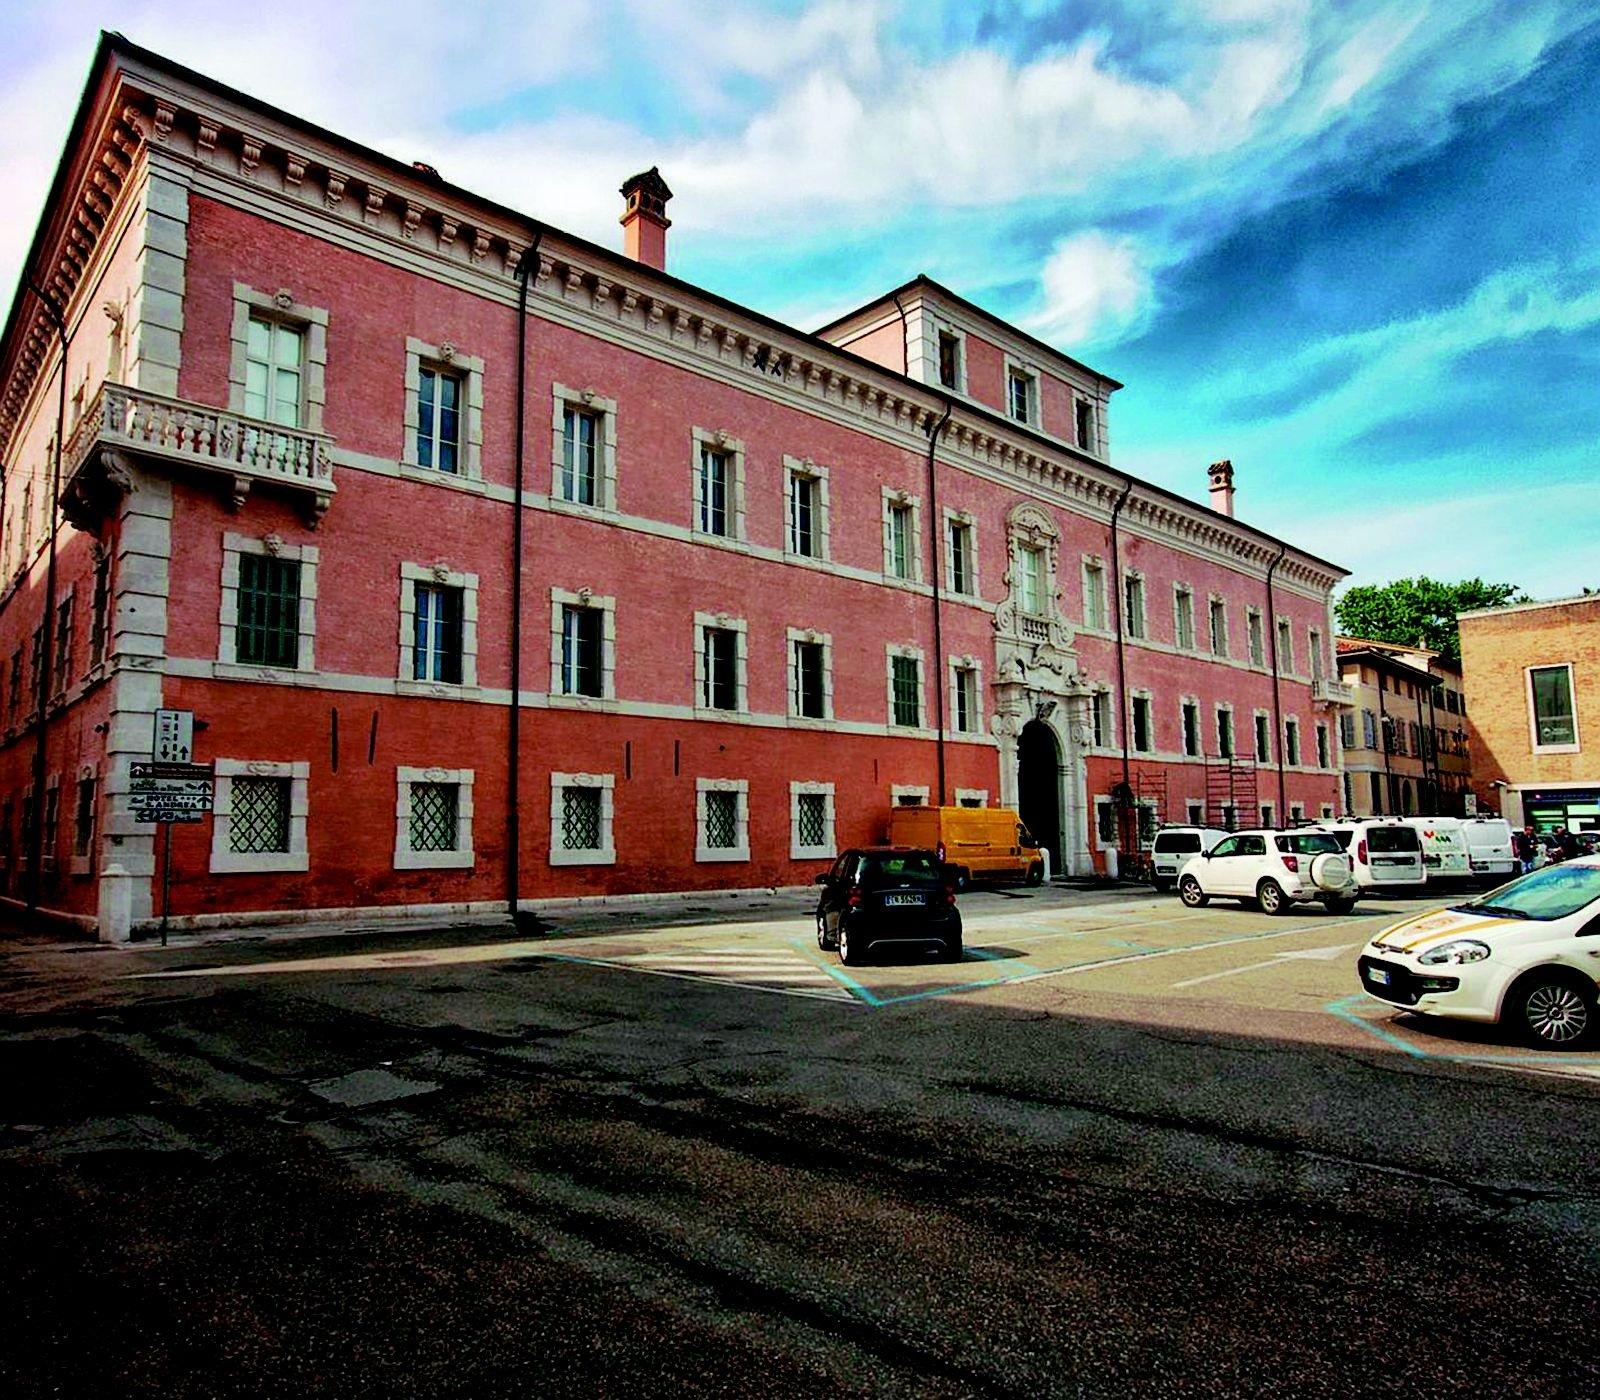 Ravenna, riaprono due mostre a Palazzo Rasponi